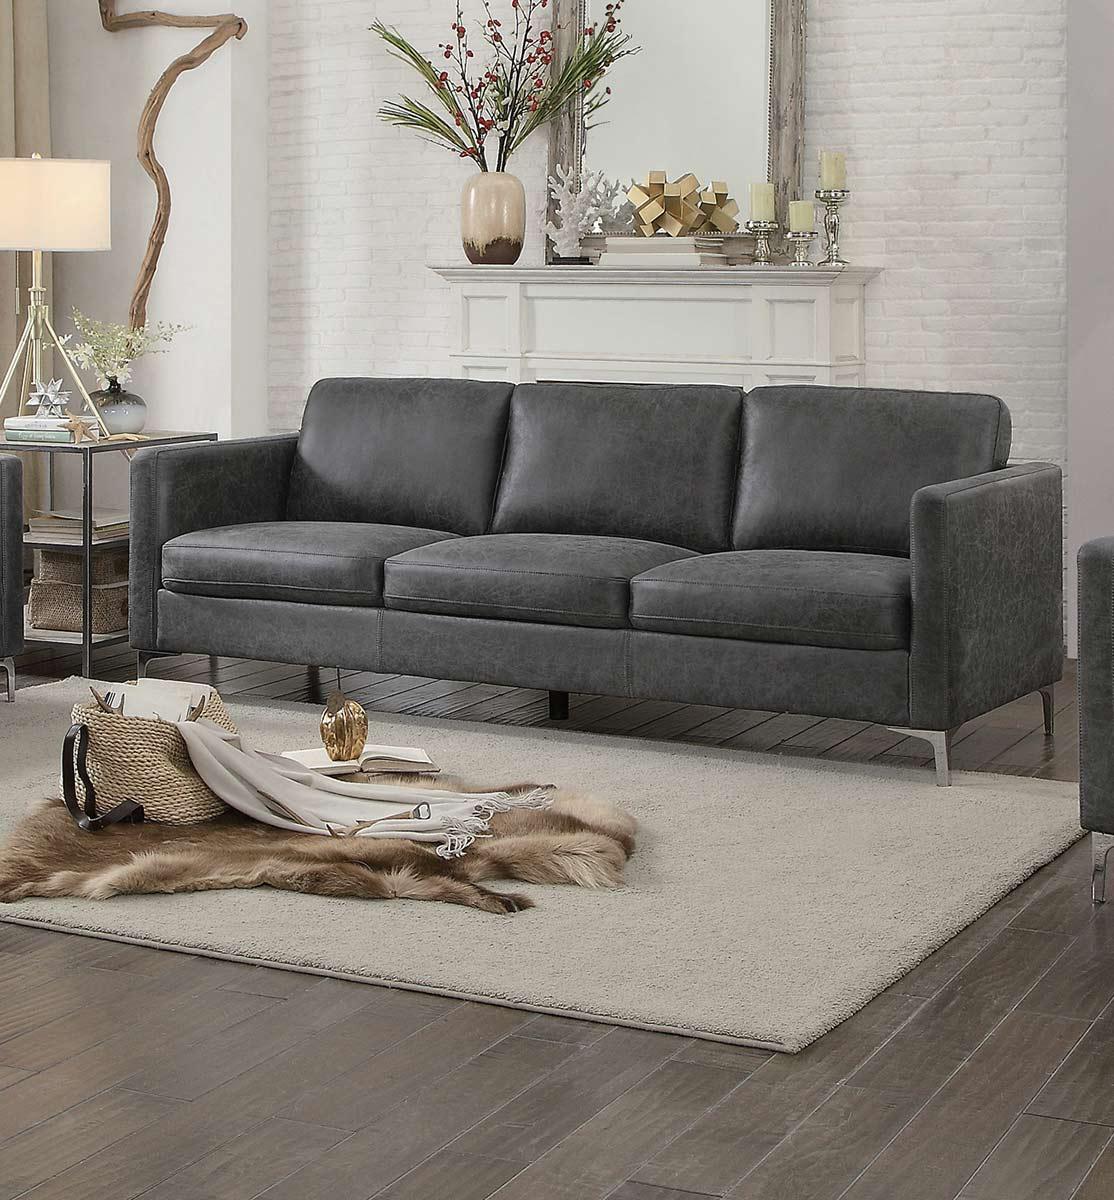 Homelegance Breaux Sofa - Gray Fabric